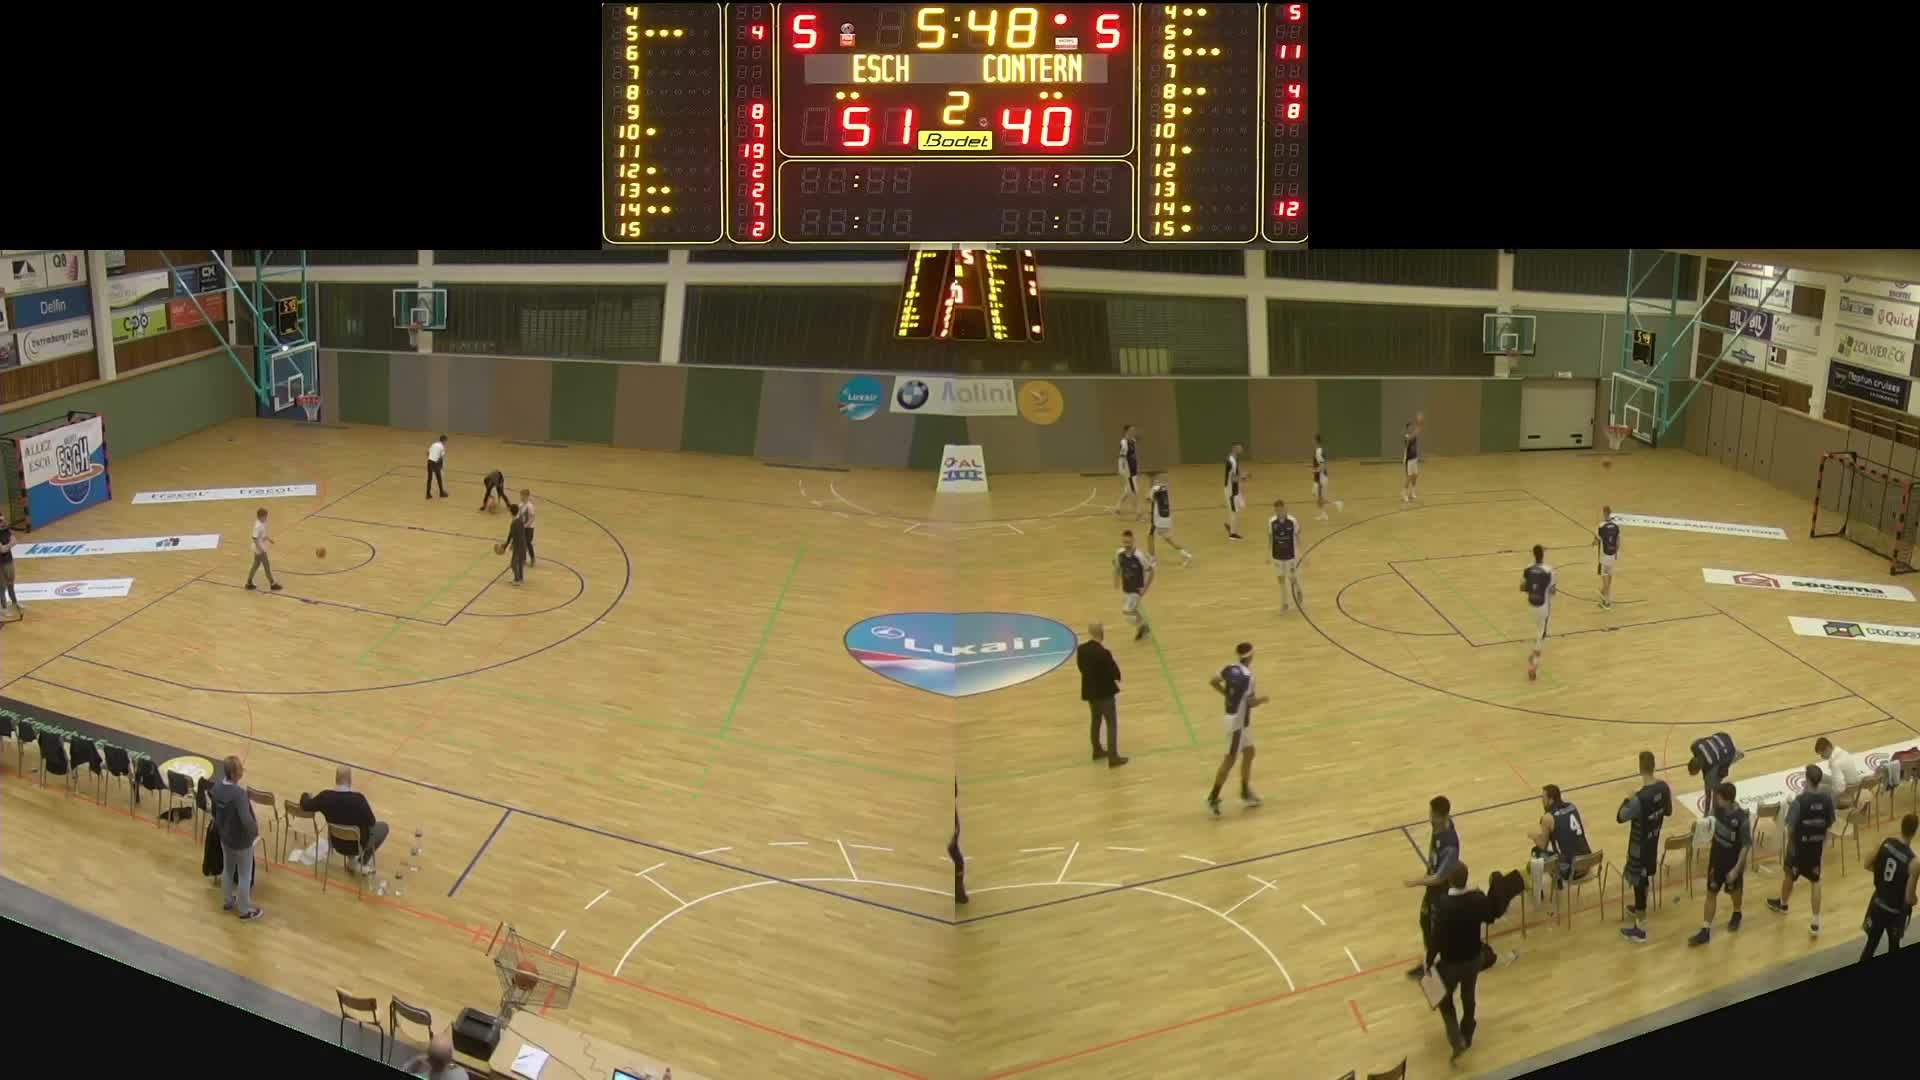 Basket Esch ( Seniors A ) - Contern - 30.11.2019